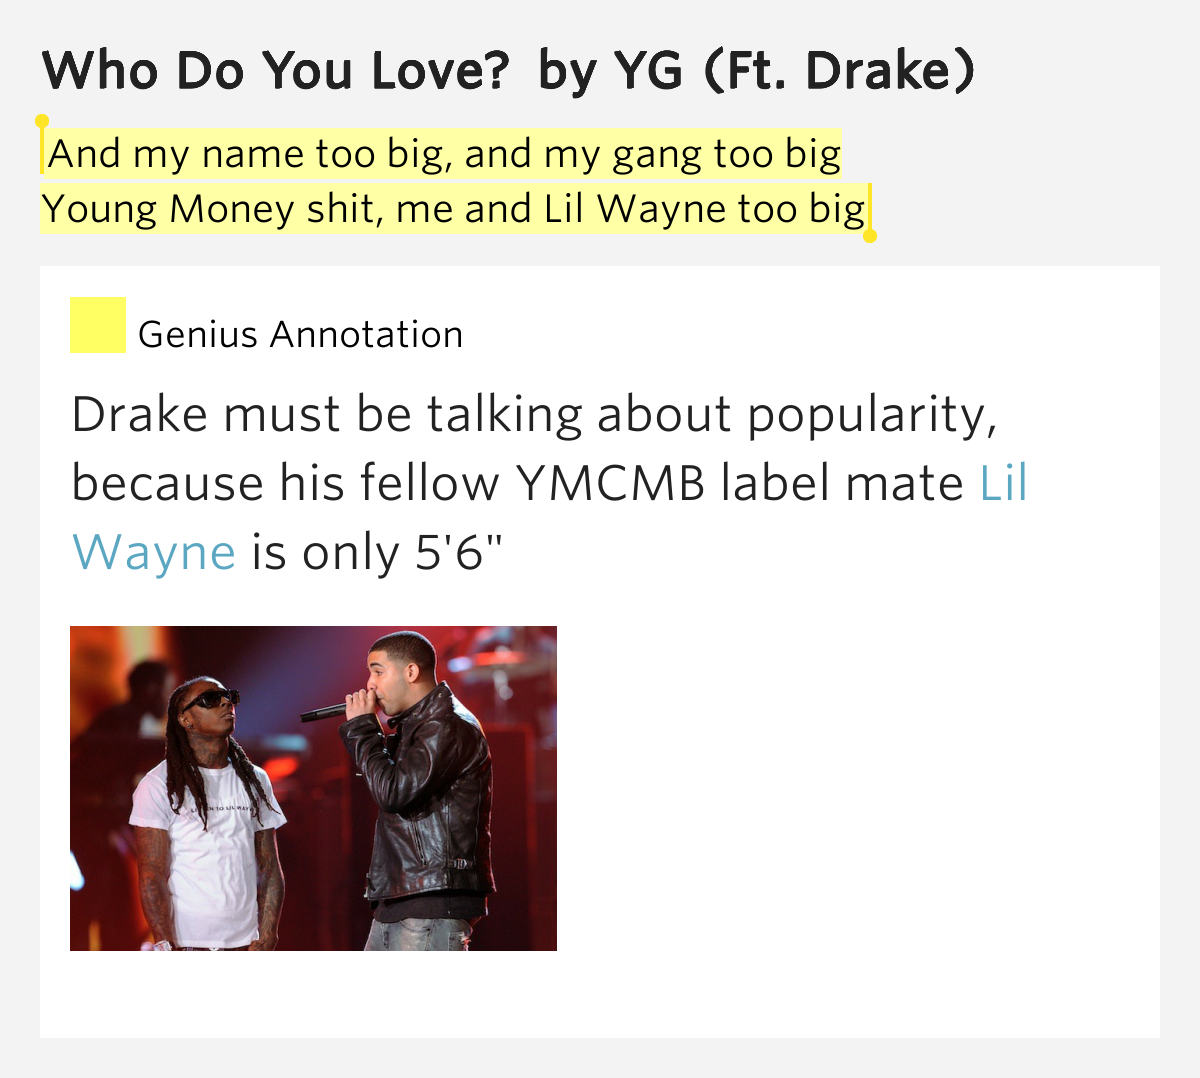 Yg Who Do You Love Lyrics And my name too...